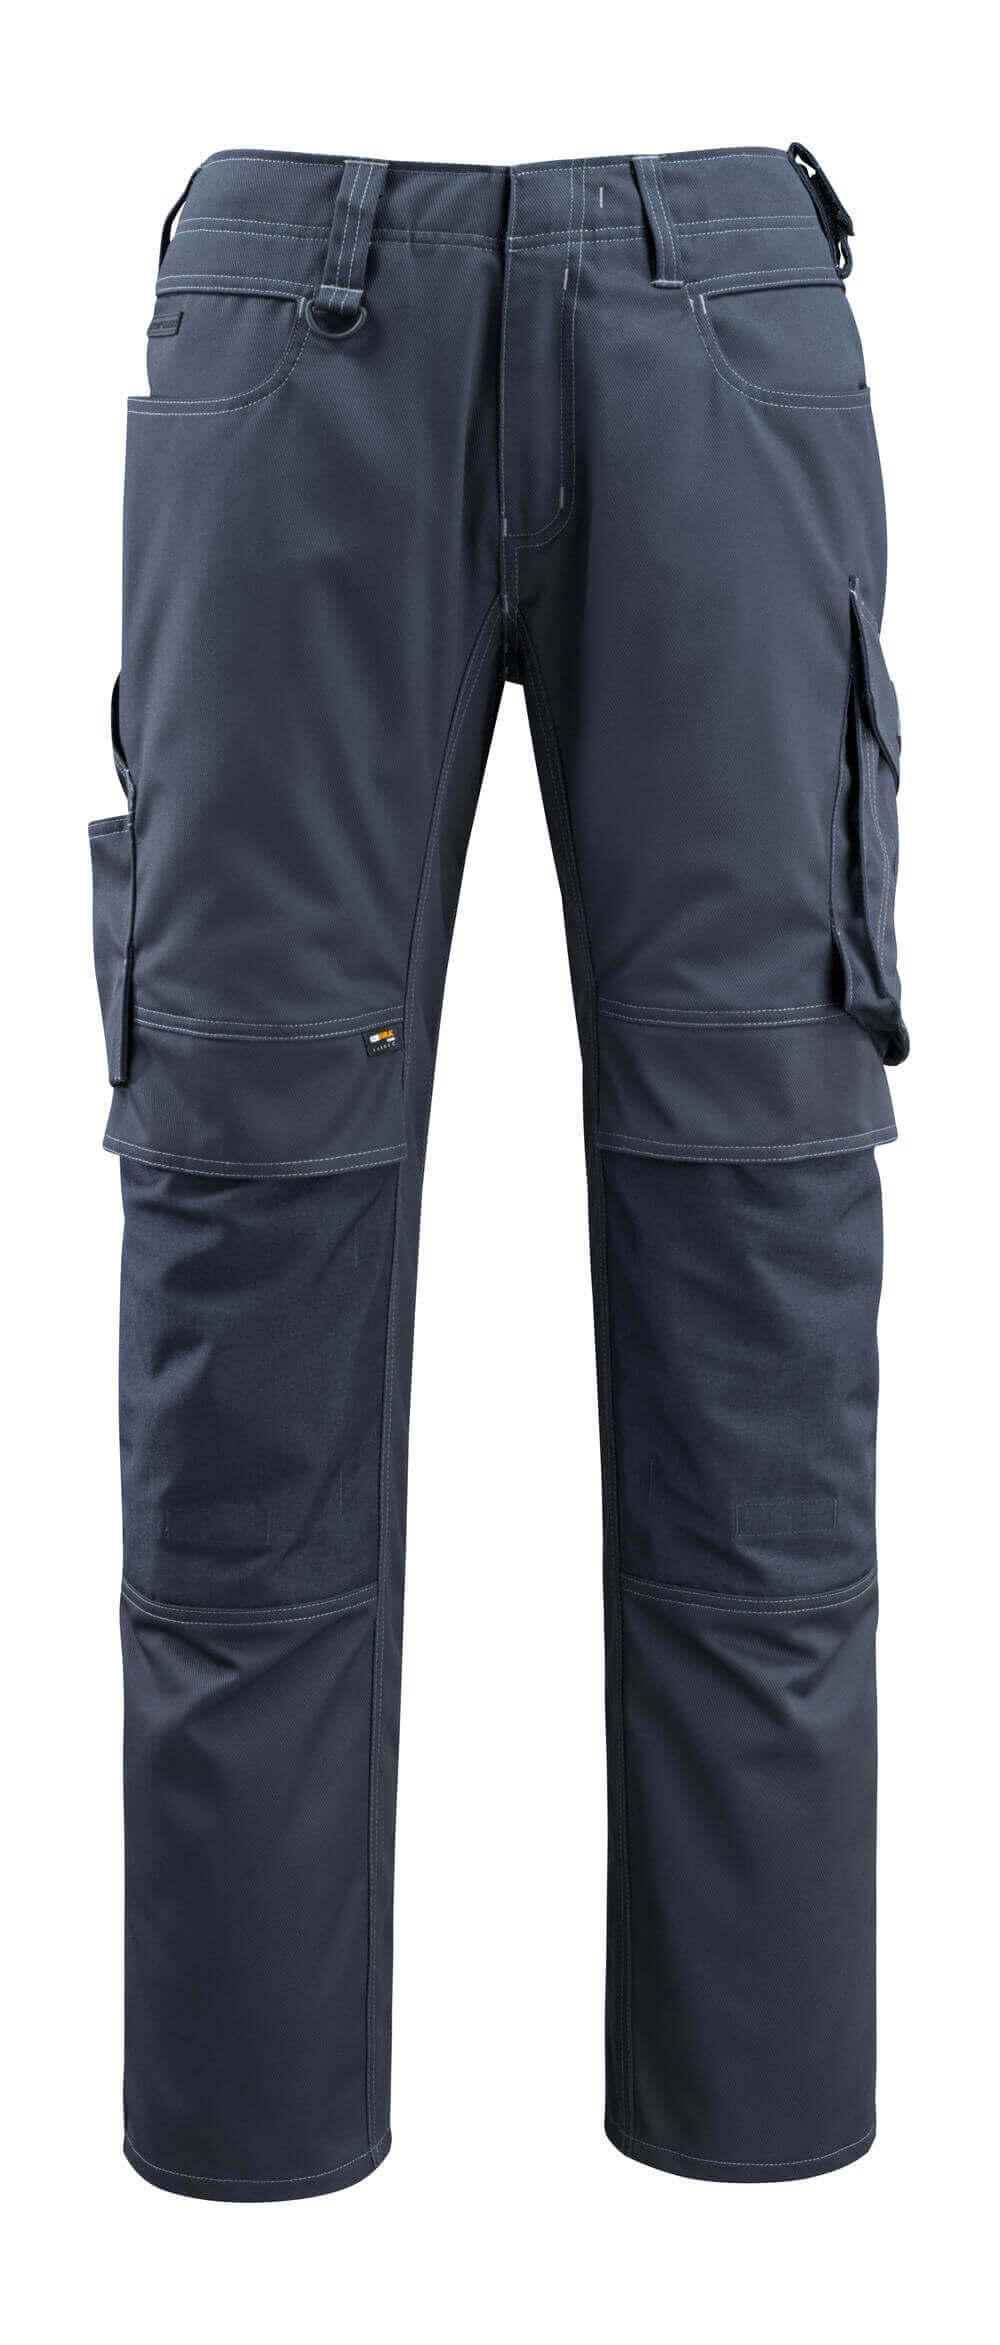 12479-203-010 Pants with kneepad pockets - dark navy